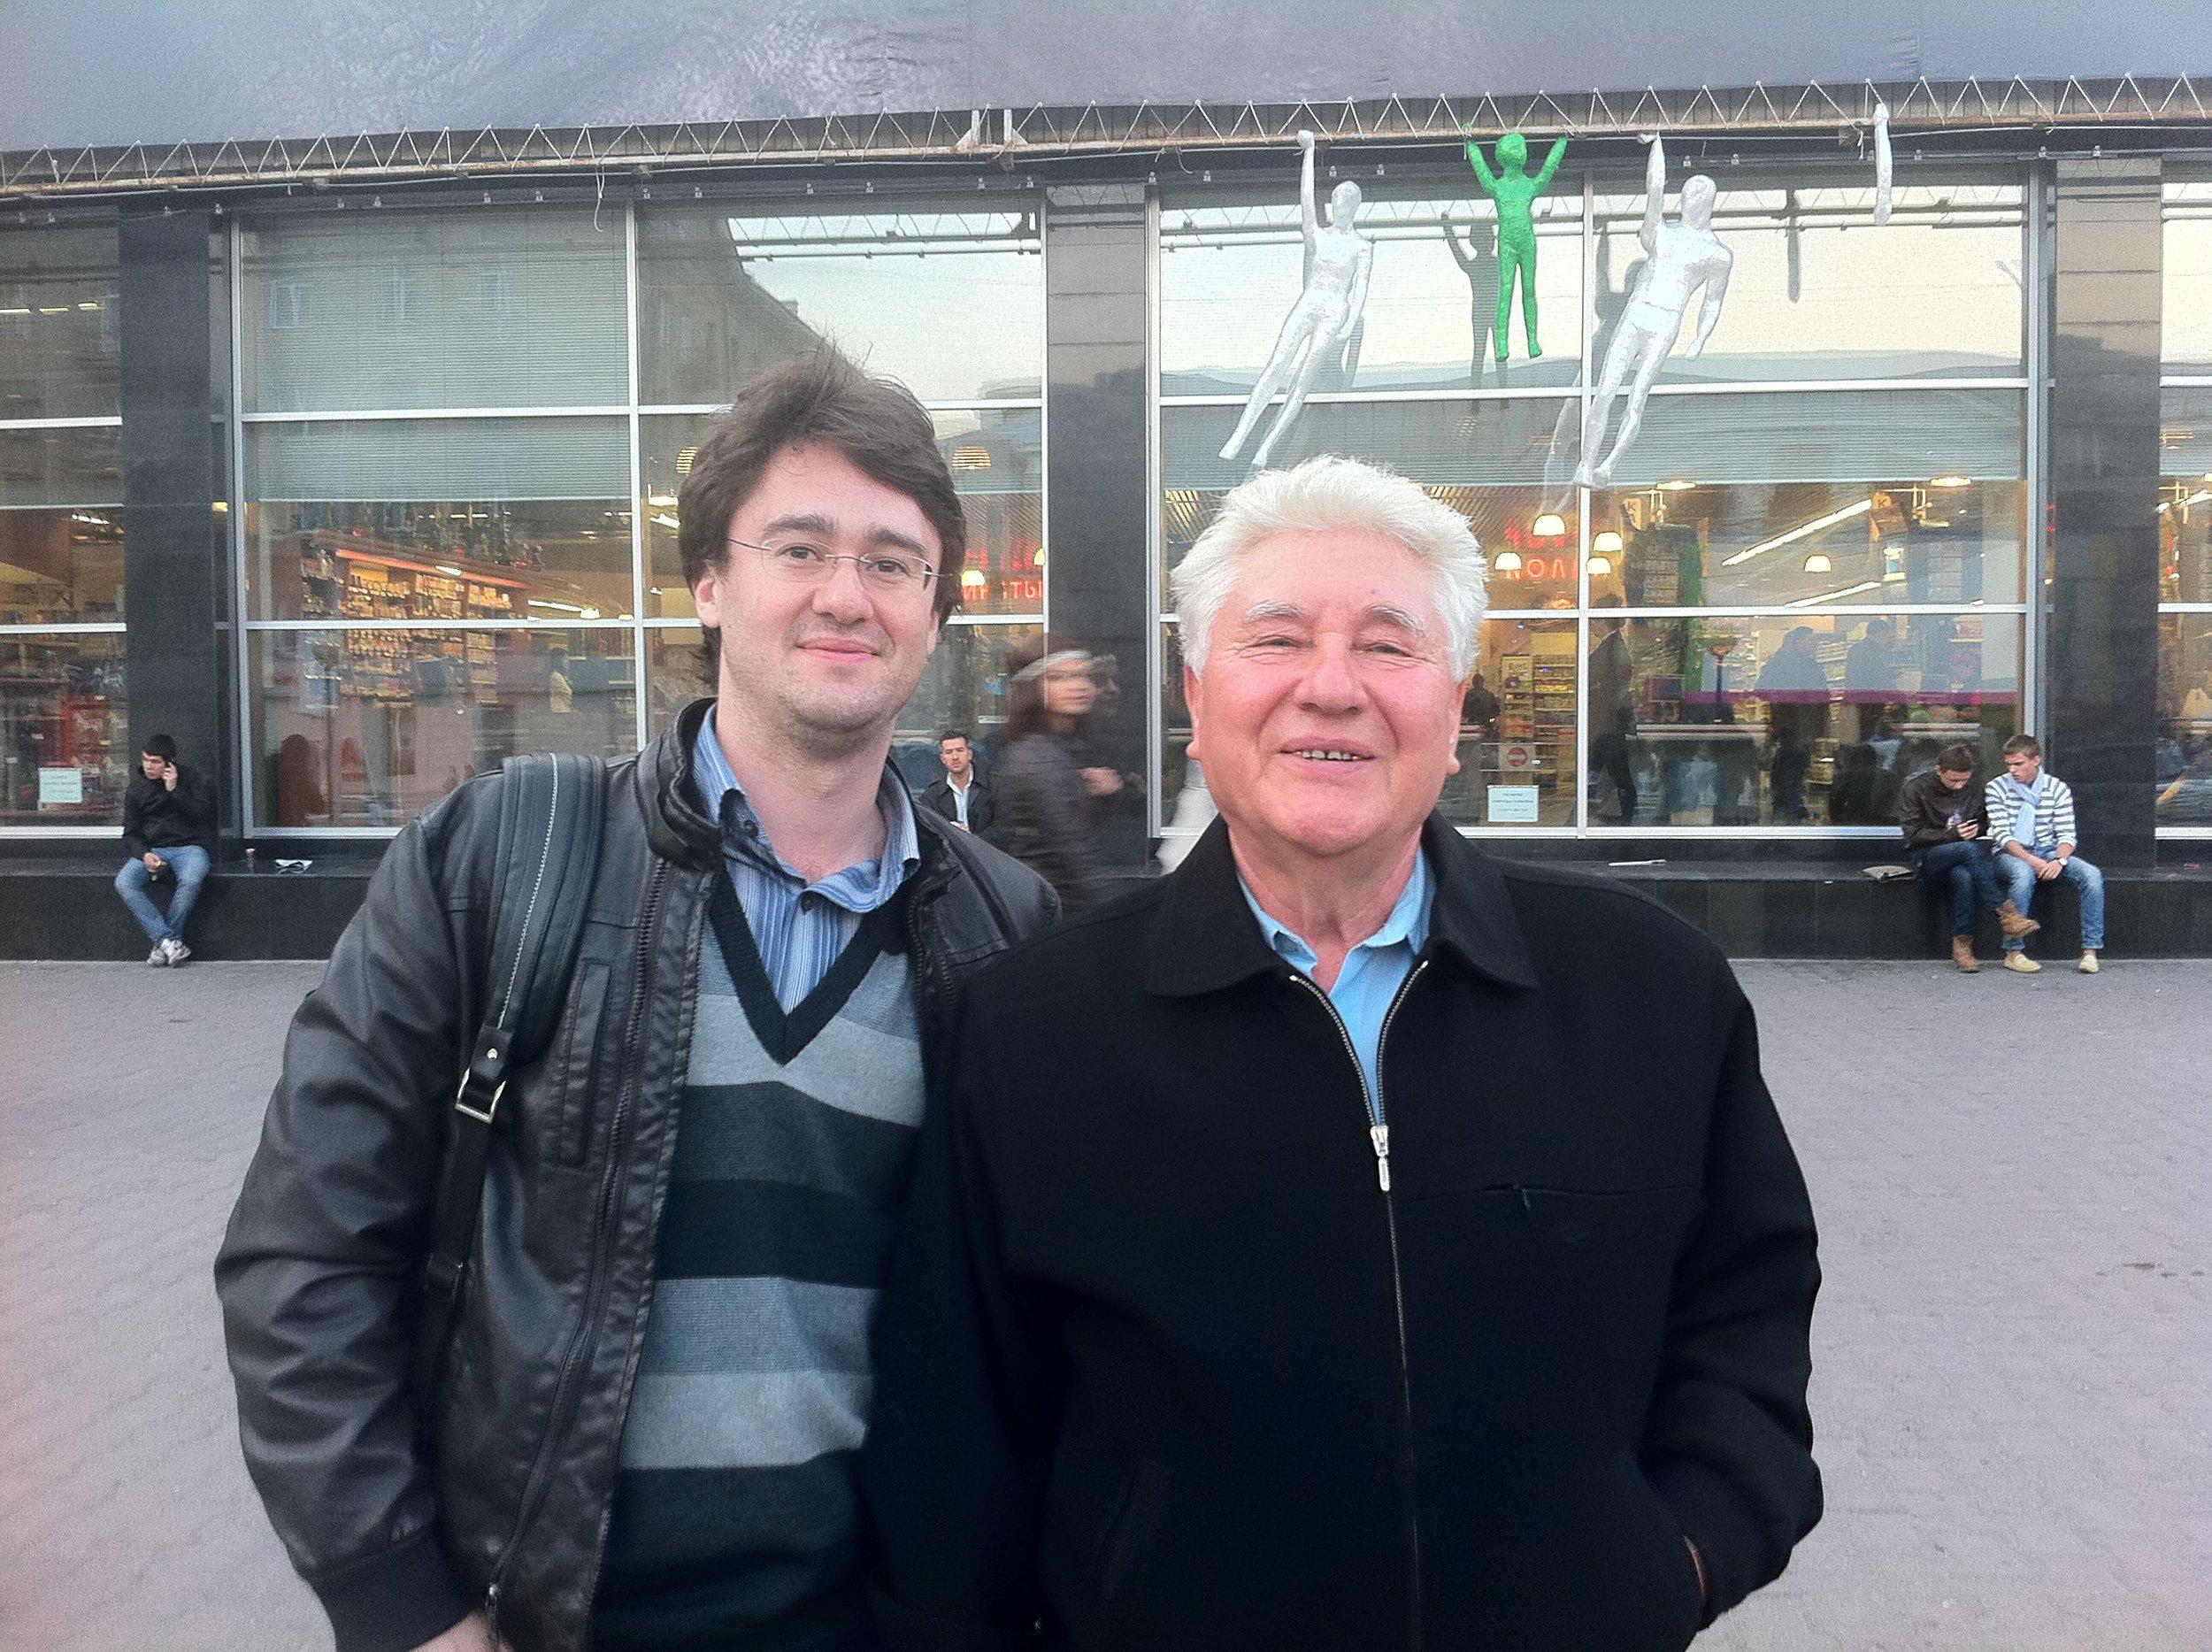 In Russia in 2011 with Professor Yuriy Kuzin